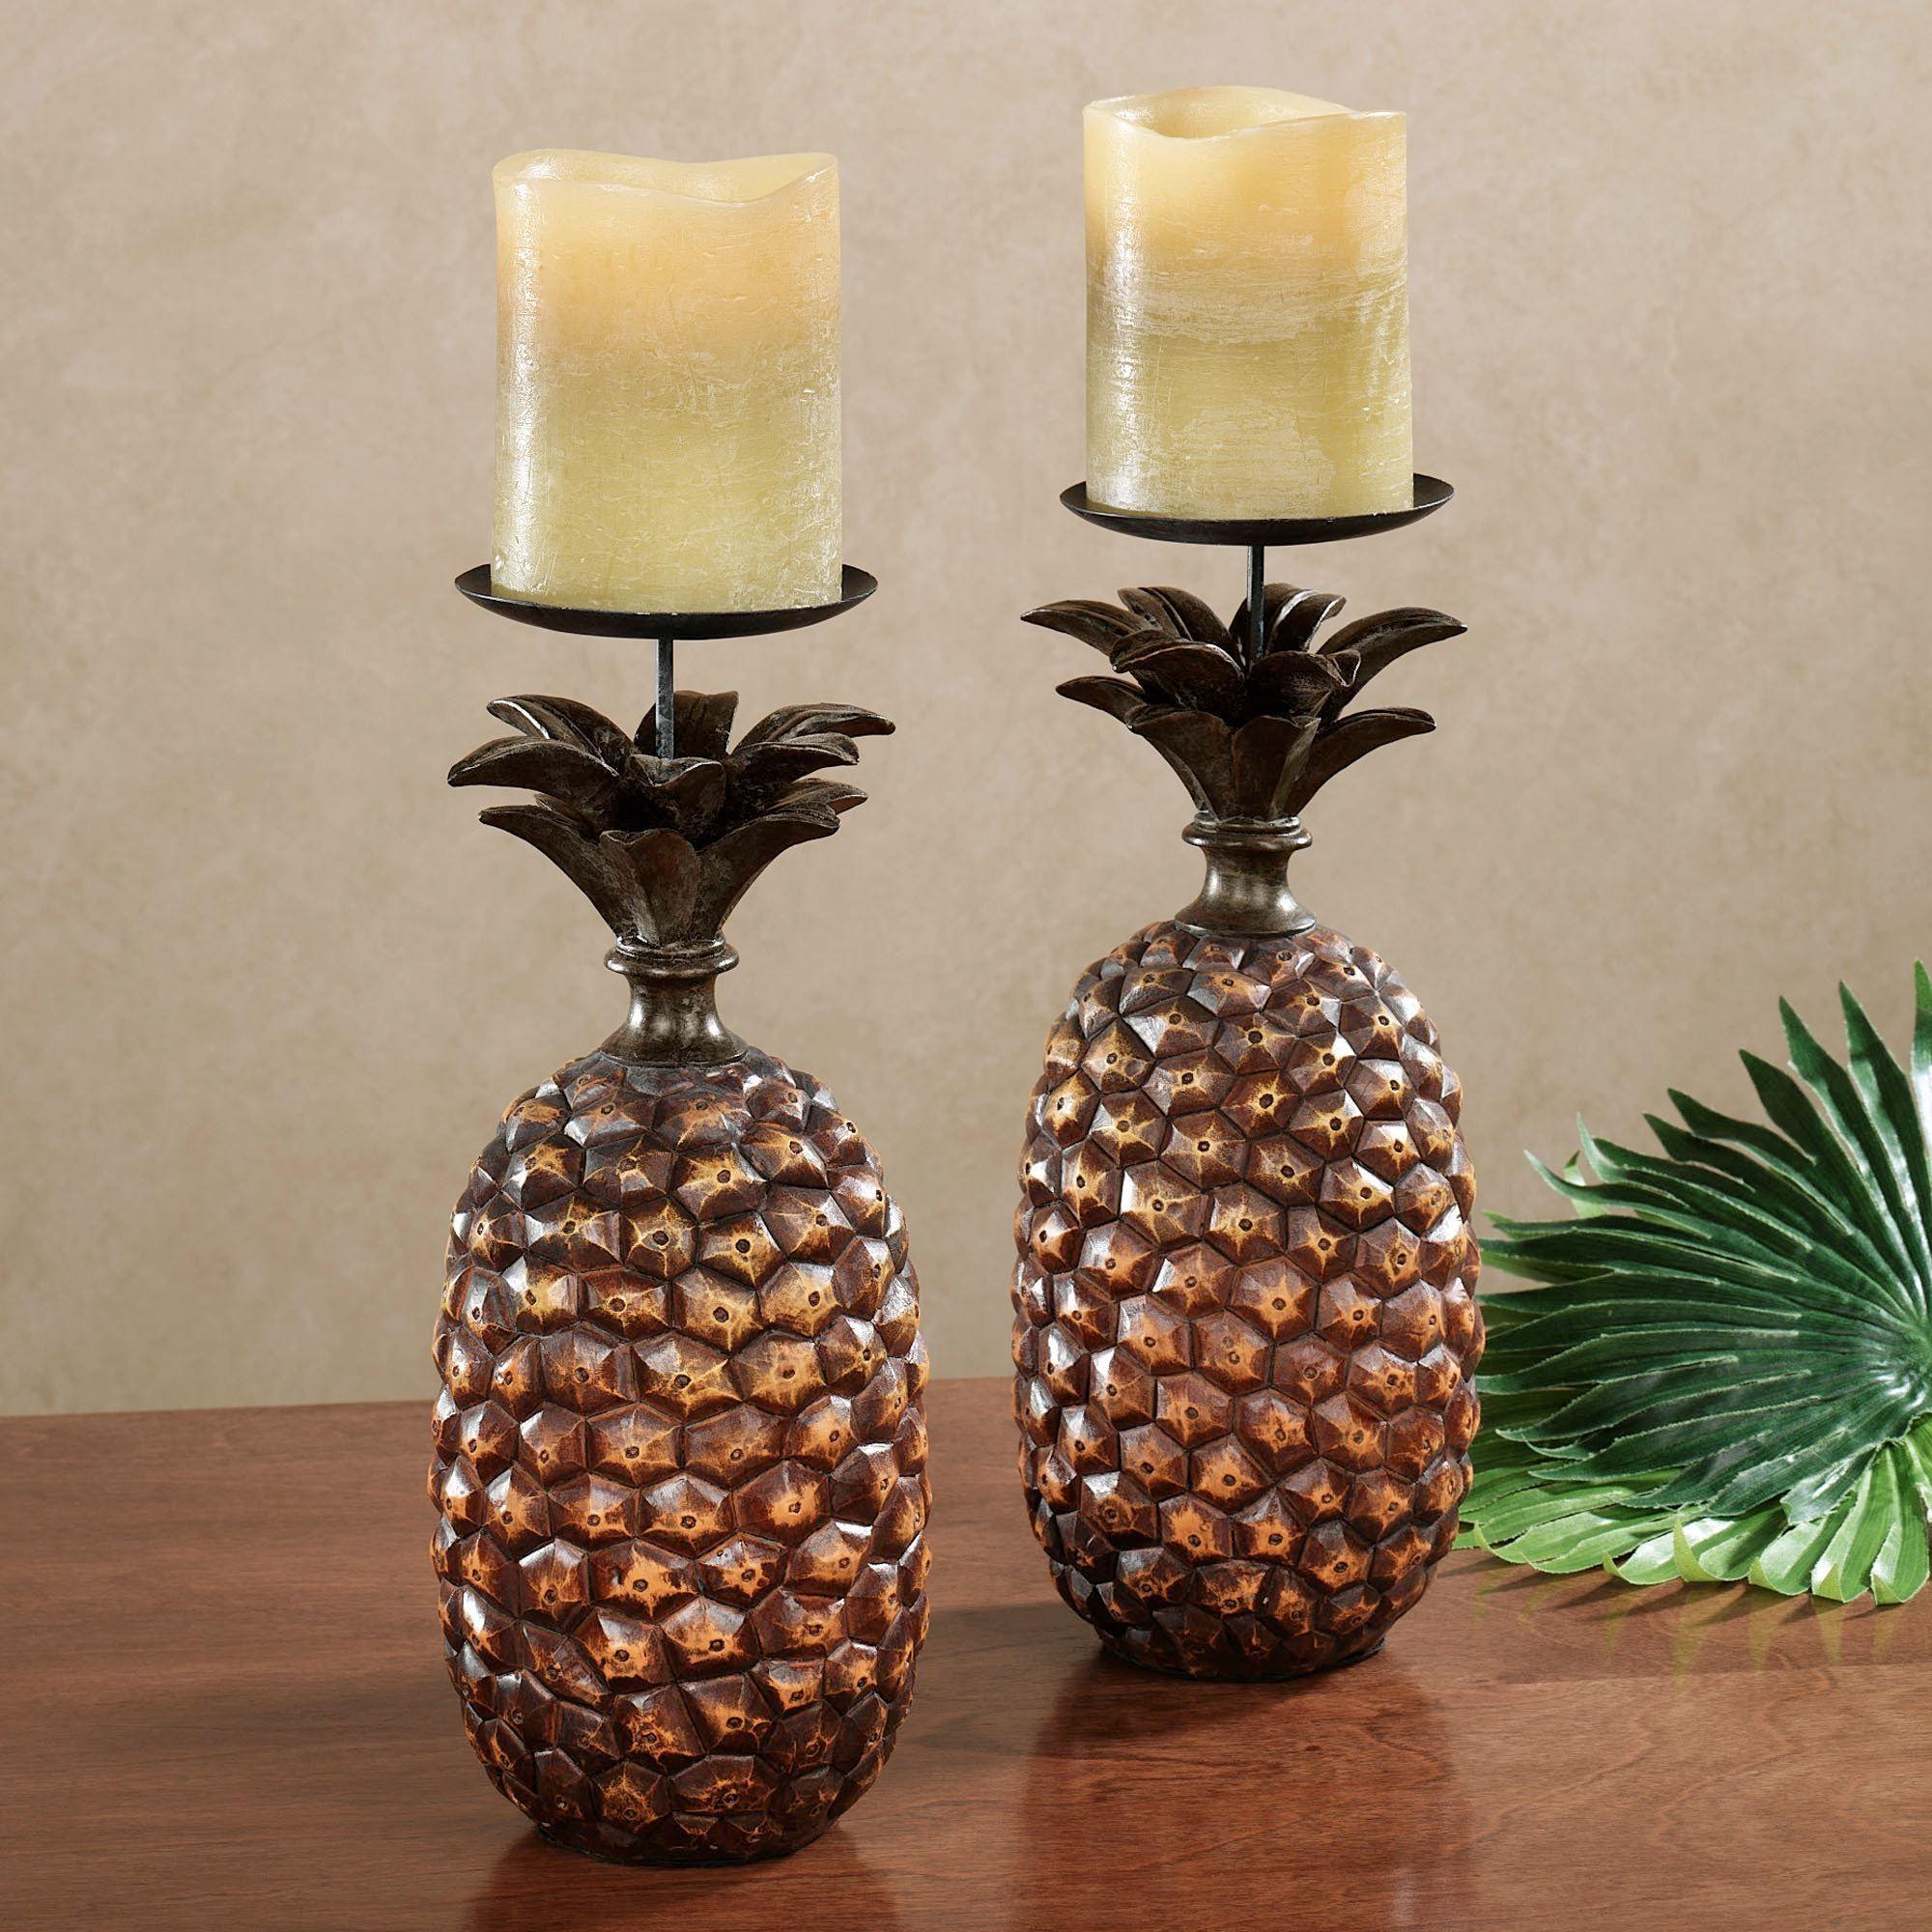 Pineapple candleholder pair